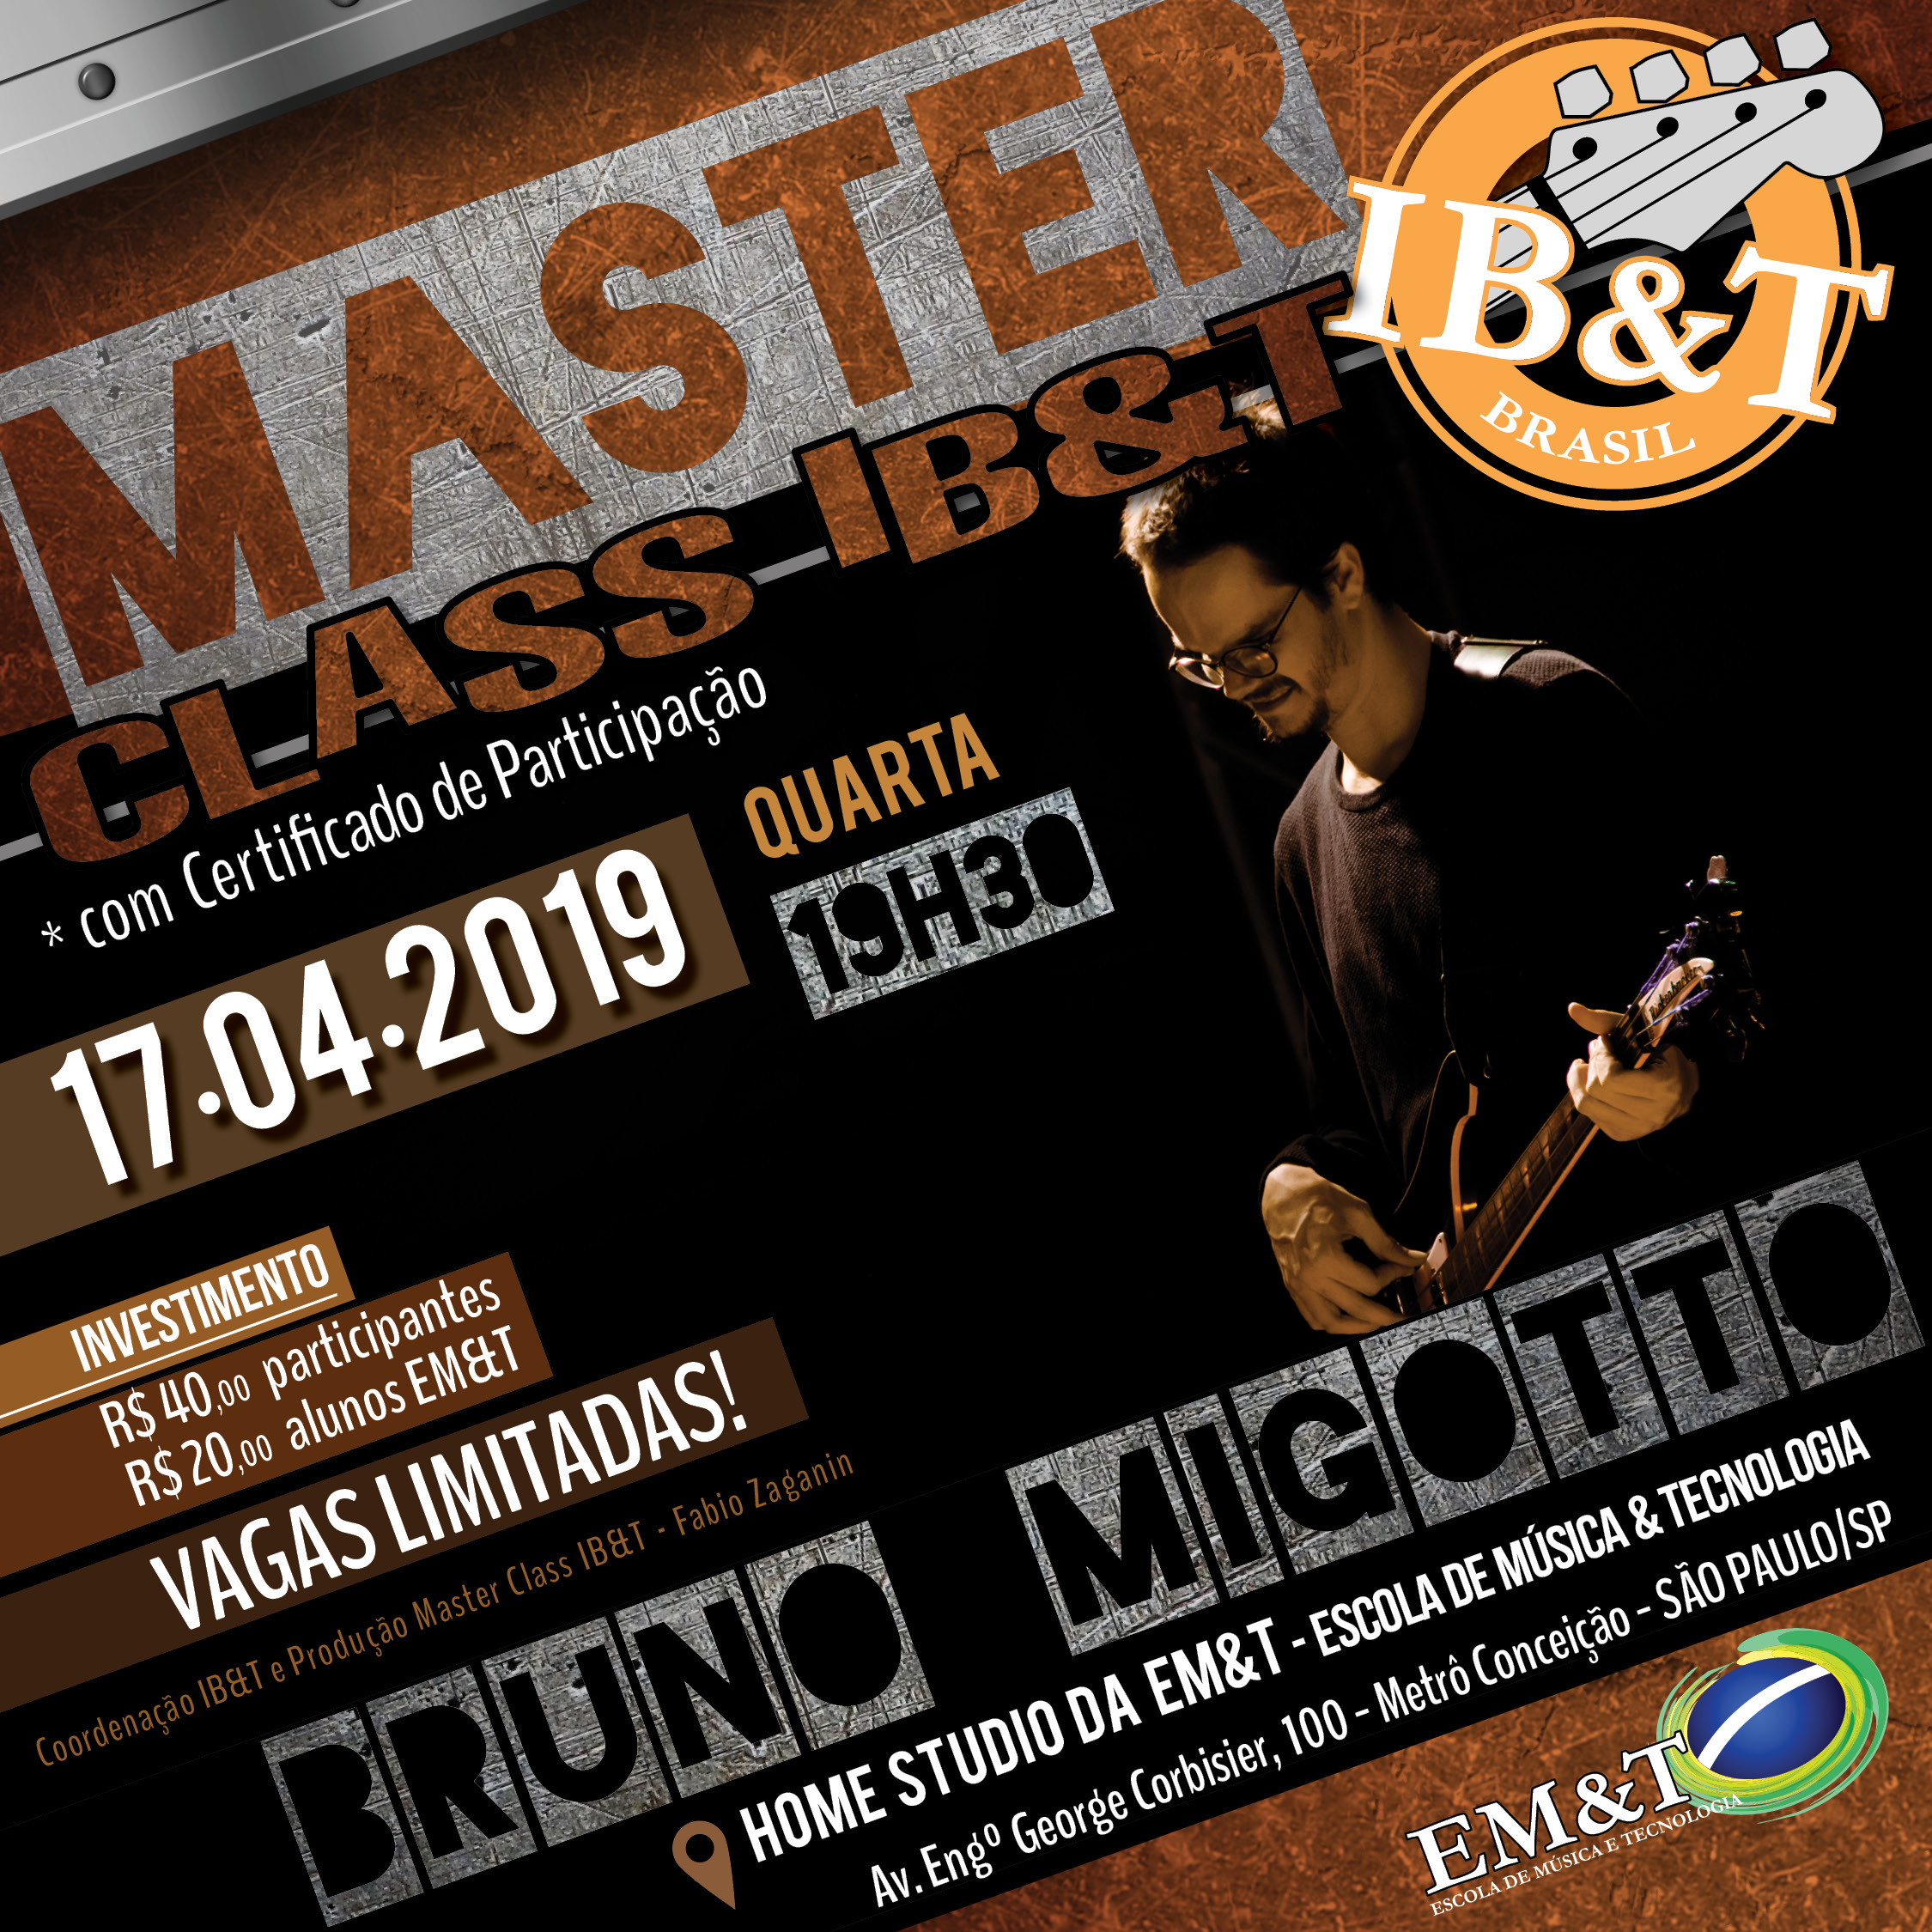 Masterclass Bruno Migoto na EM&T 2019.